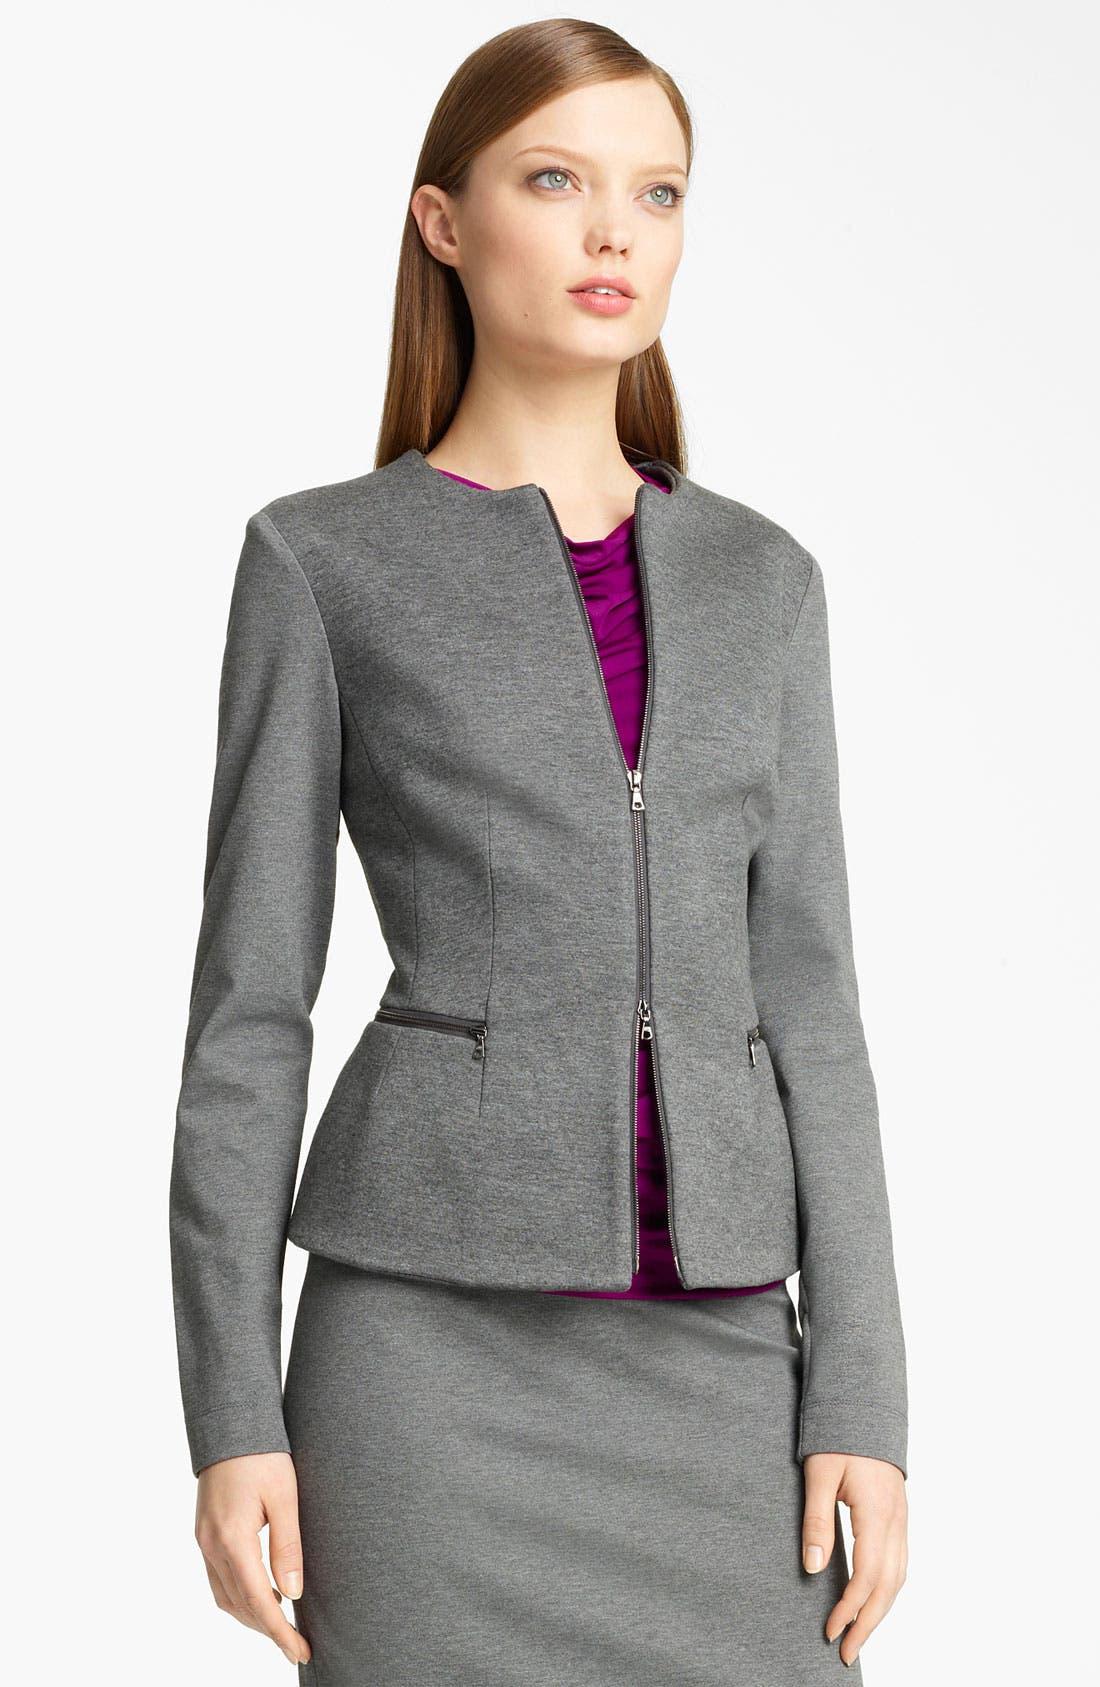 Alternate Image 1 Selected - Lida Baday Bonded Jersey Jacket